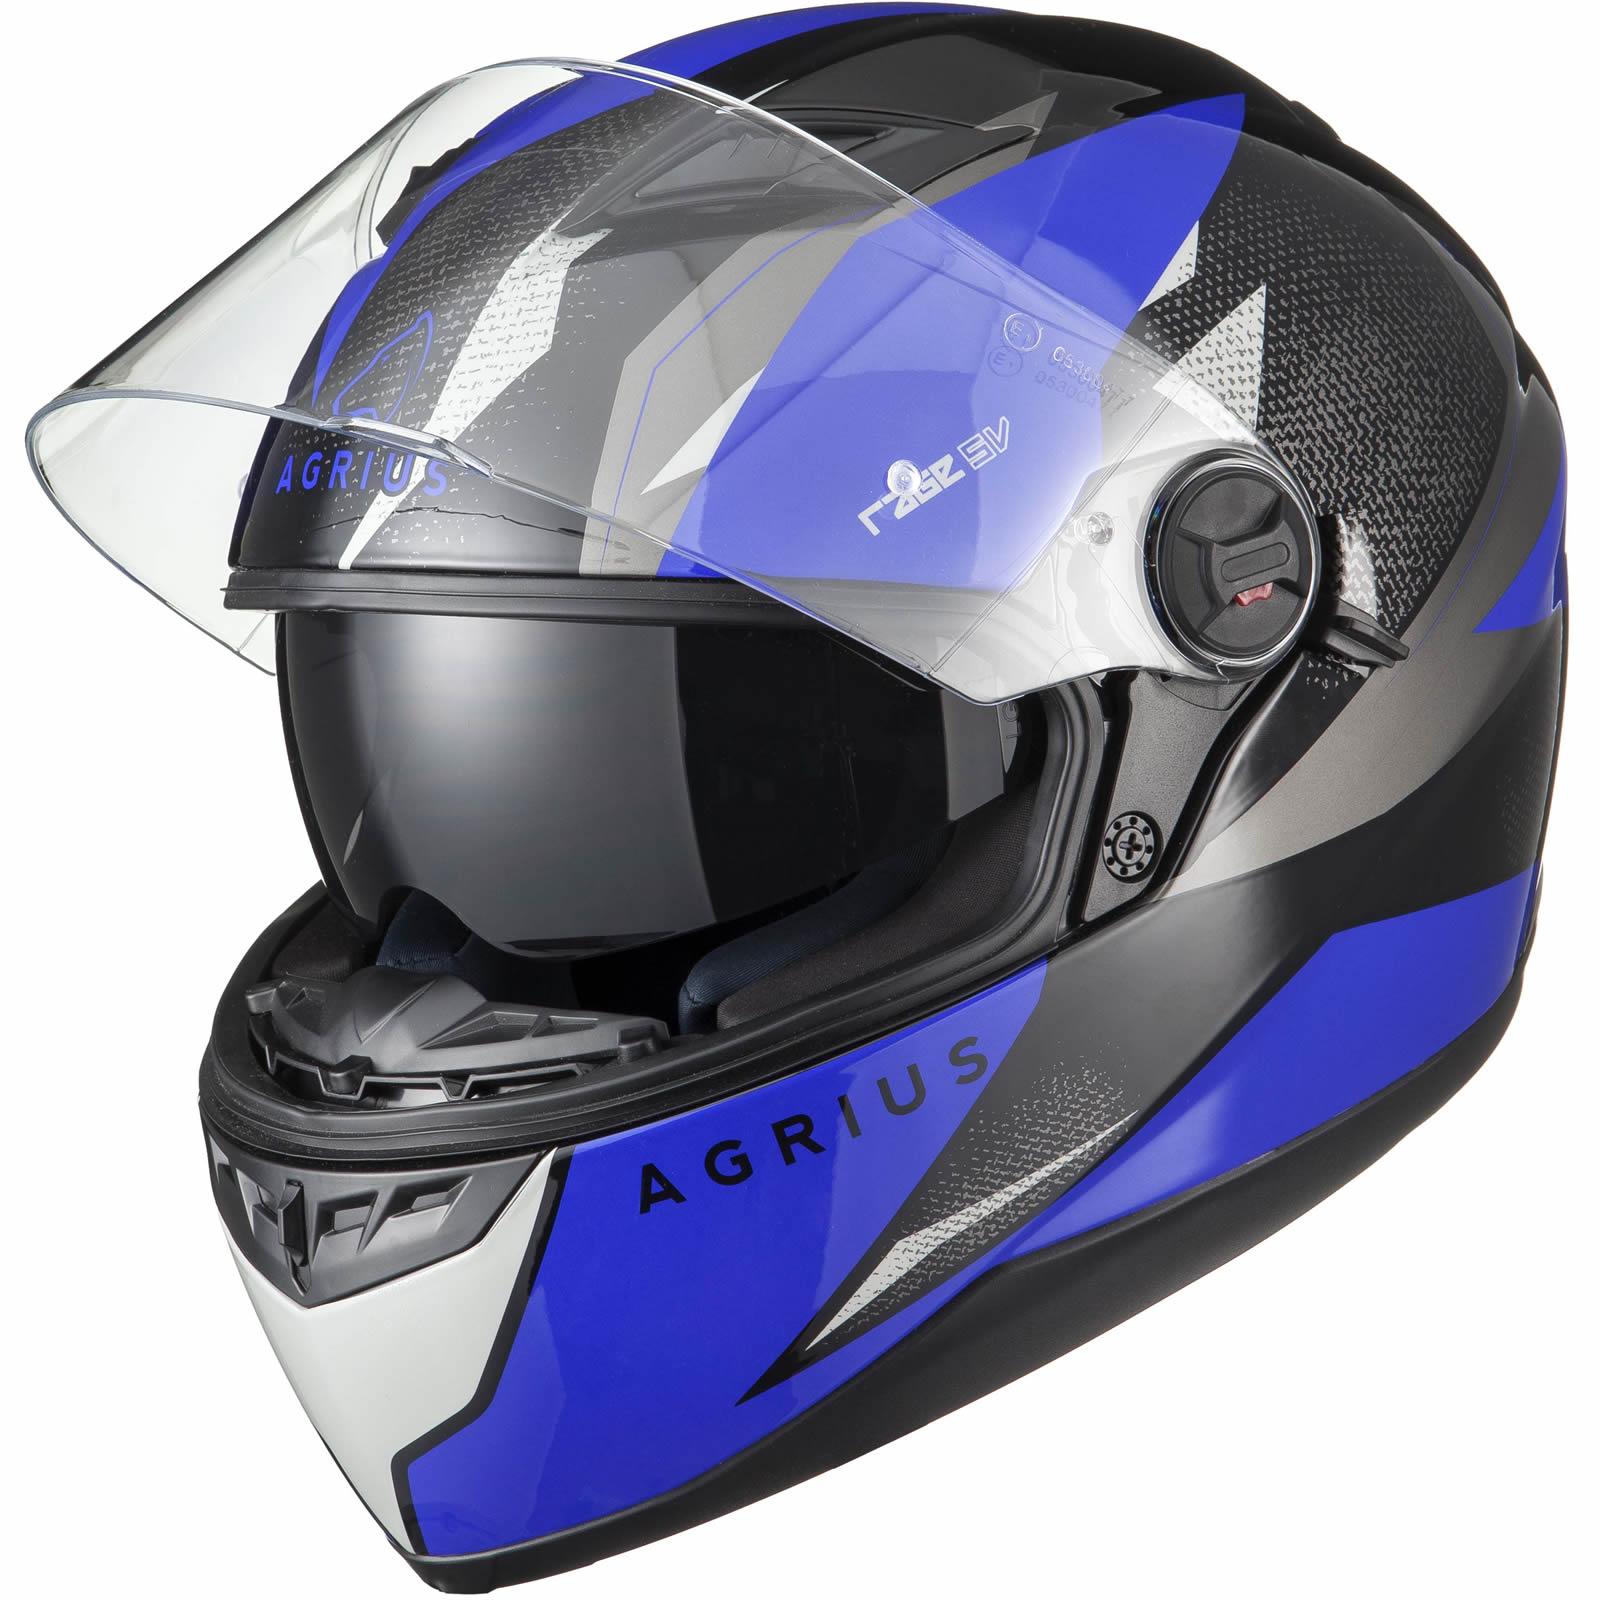 e71511bf7d92 Bike Helmets Joondalup Walmart